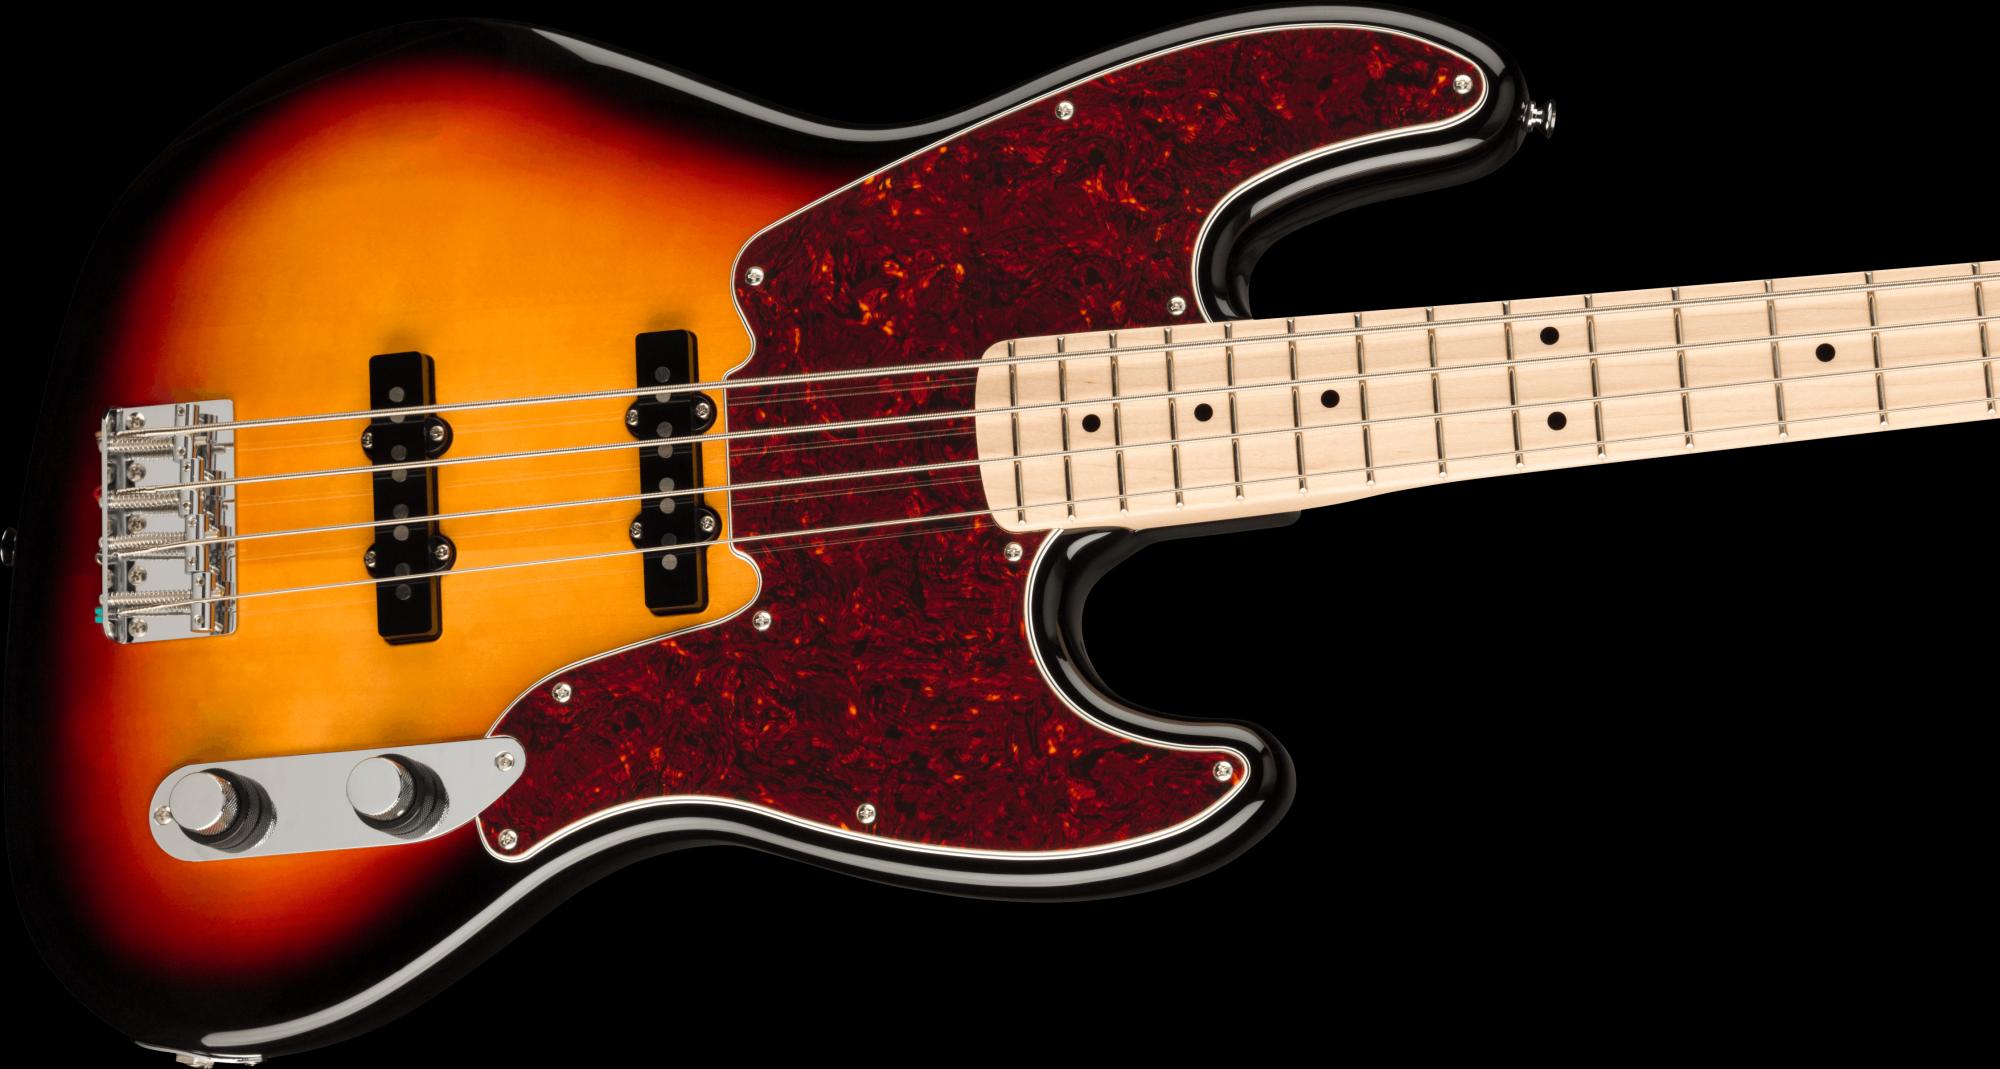 PRE-ORDER: Squier Paranormal Jazz Bass '54 Tortoiseshell Pickguard - 3-Color Sunburst